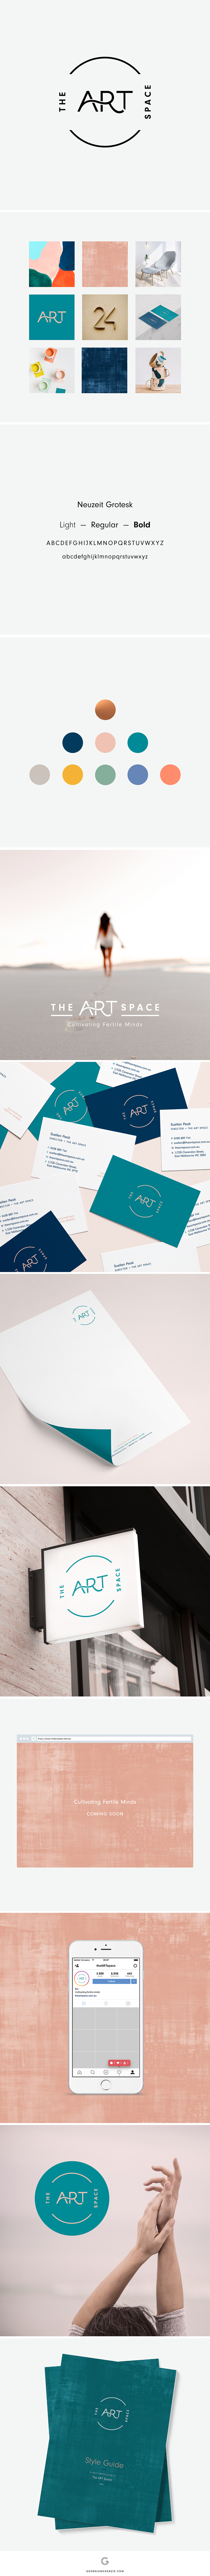 Georgie McKenzie Graphic Design Portfolio — The ART Space Branding Stationery